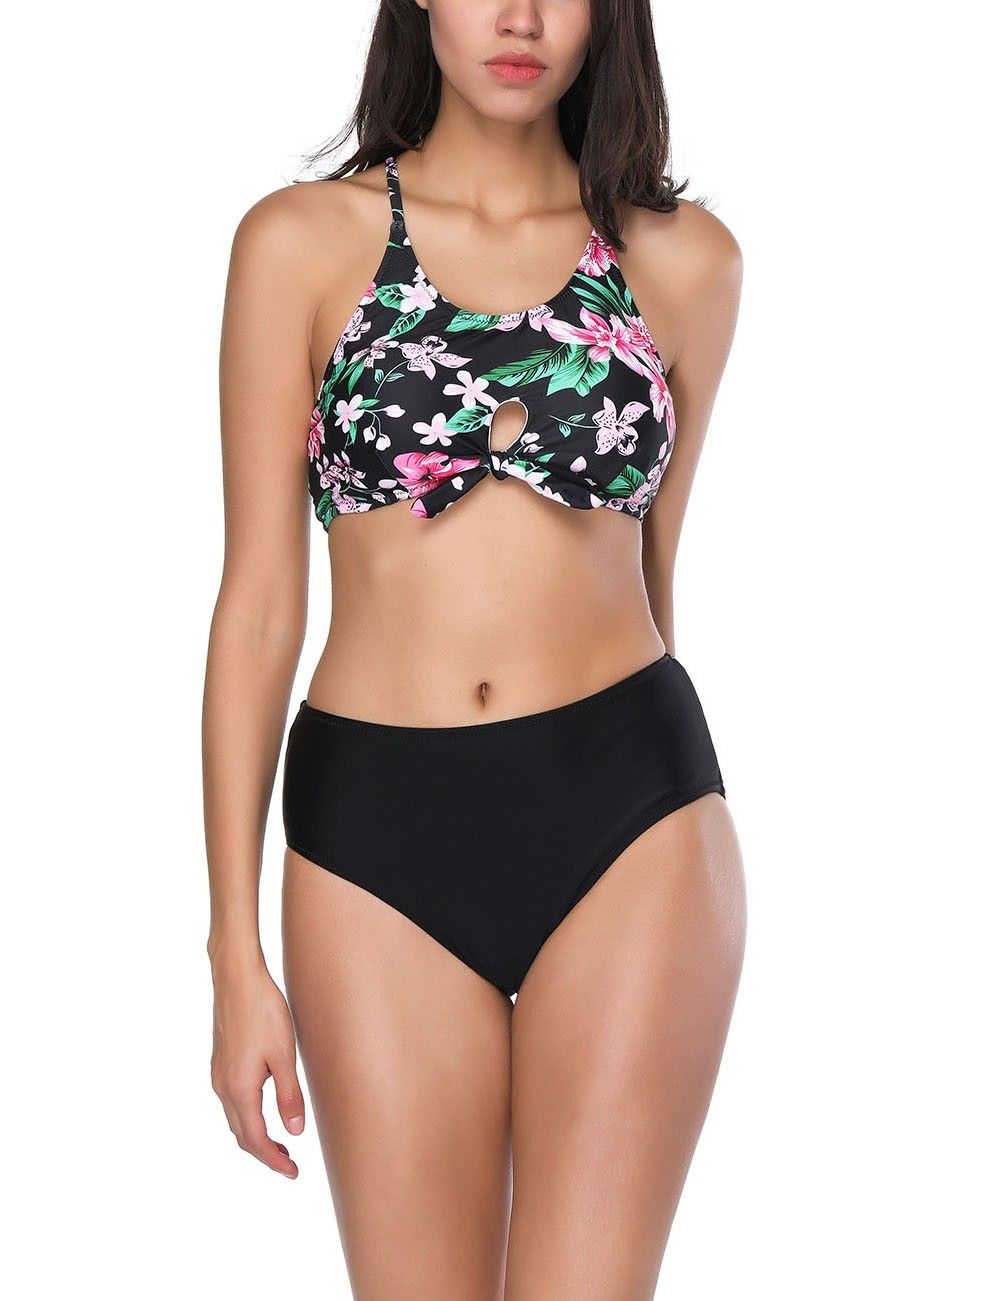 ad7a7d143466c Pink Bikini, Striped Bikini, Bikini Set, Swimsuit Cover Ups, Swimsuits,  Swimwear